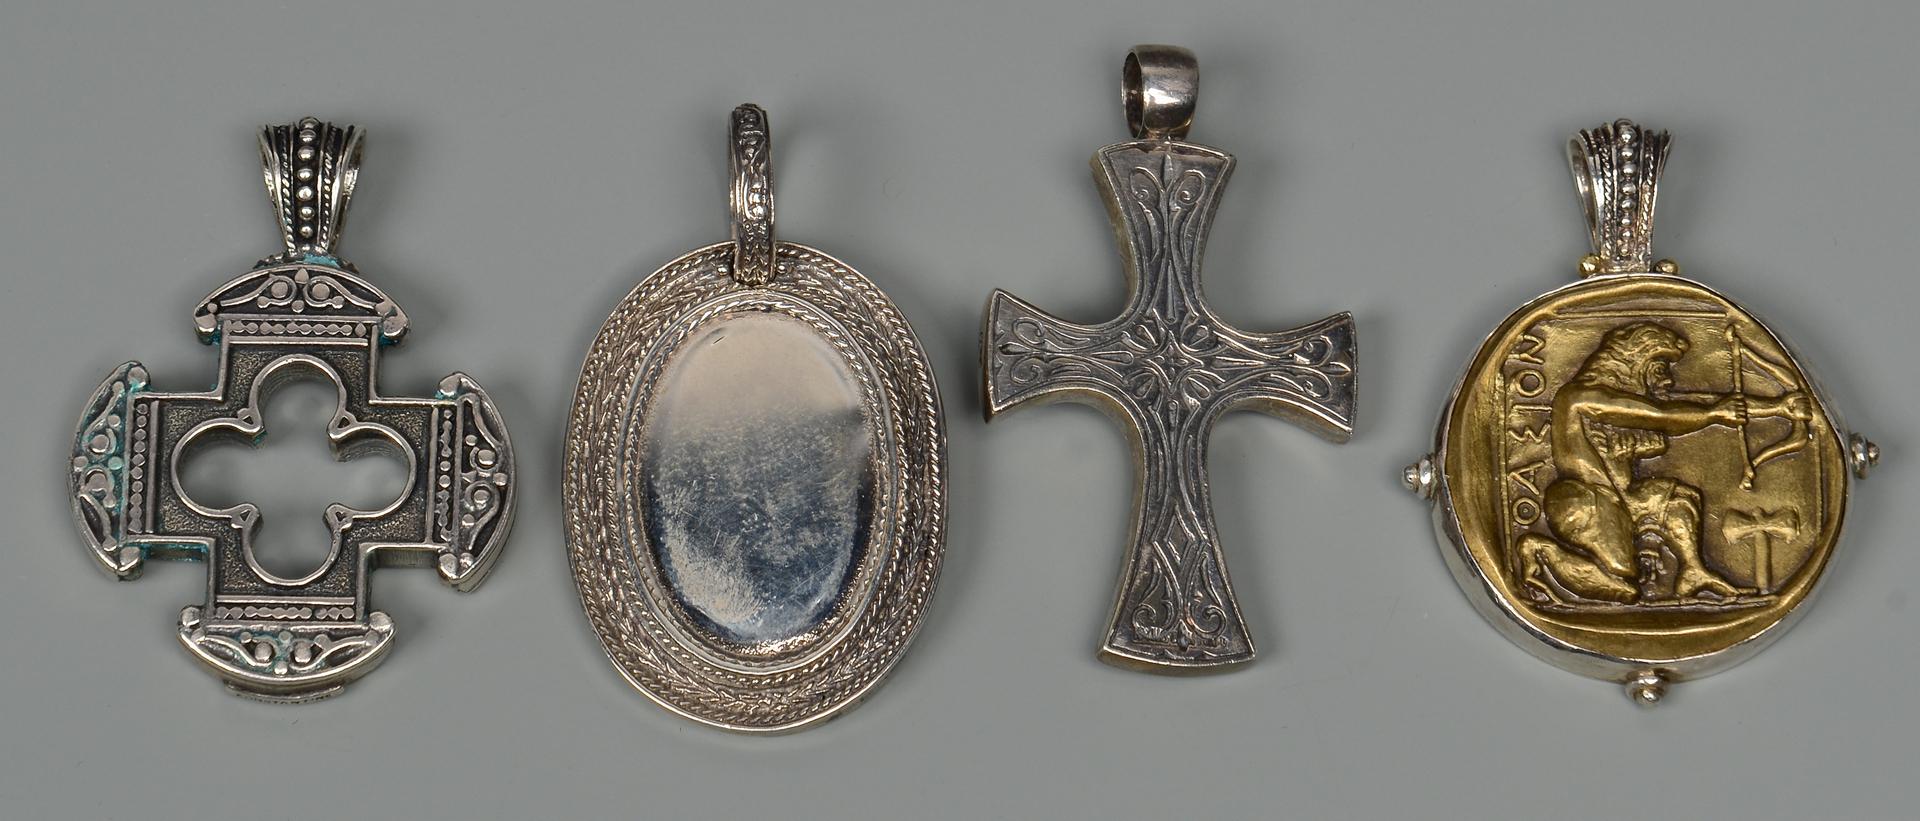 Lot 798: Group of Konstantino Men's Jewelry